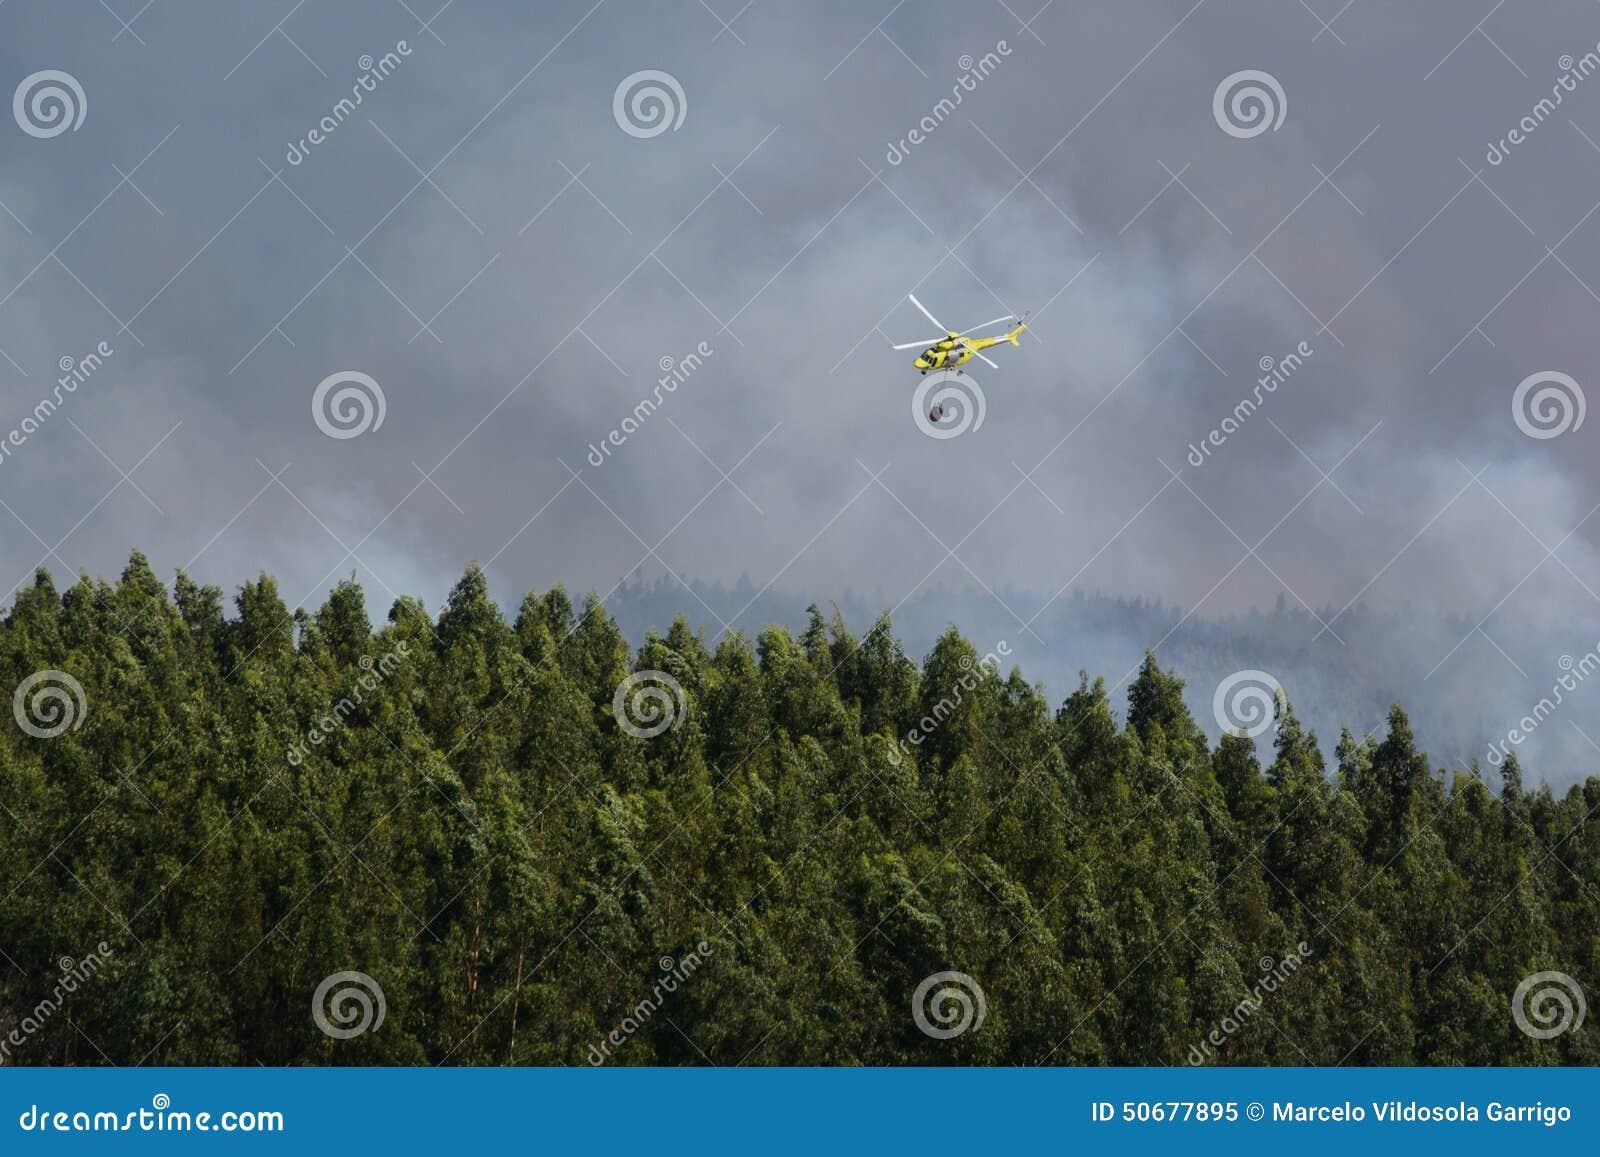 Download 直升机 库存图片. 图片 包括有 机场, 森林, bataan, 野火, 直升机, 故障, 危险, 推进器 - 50677895